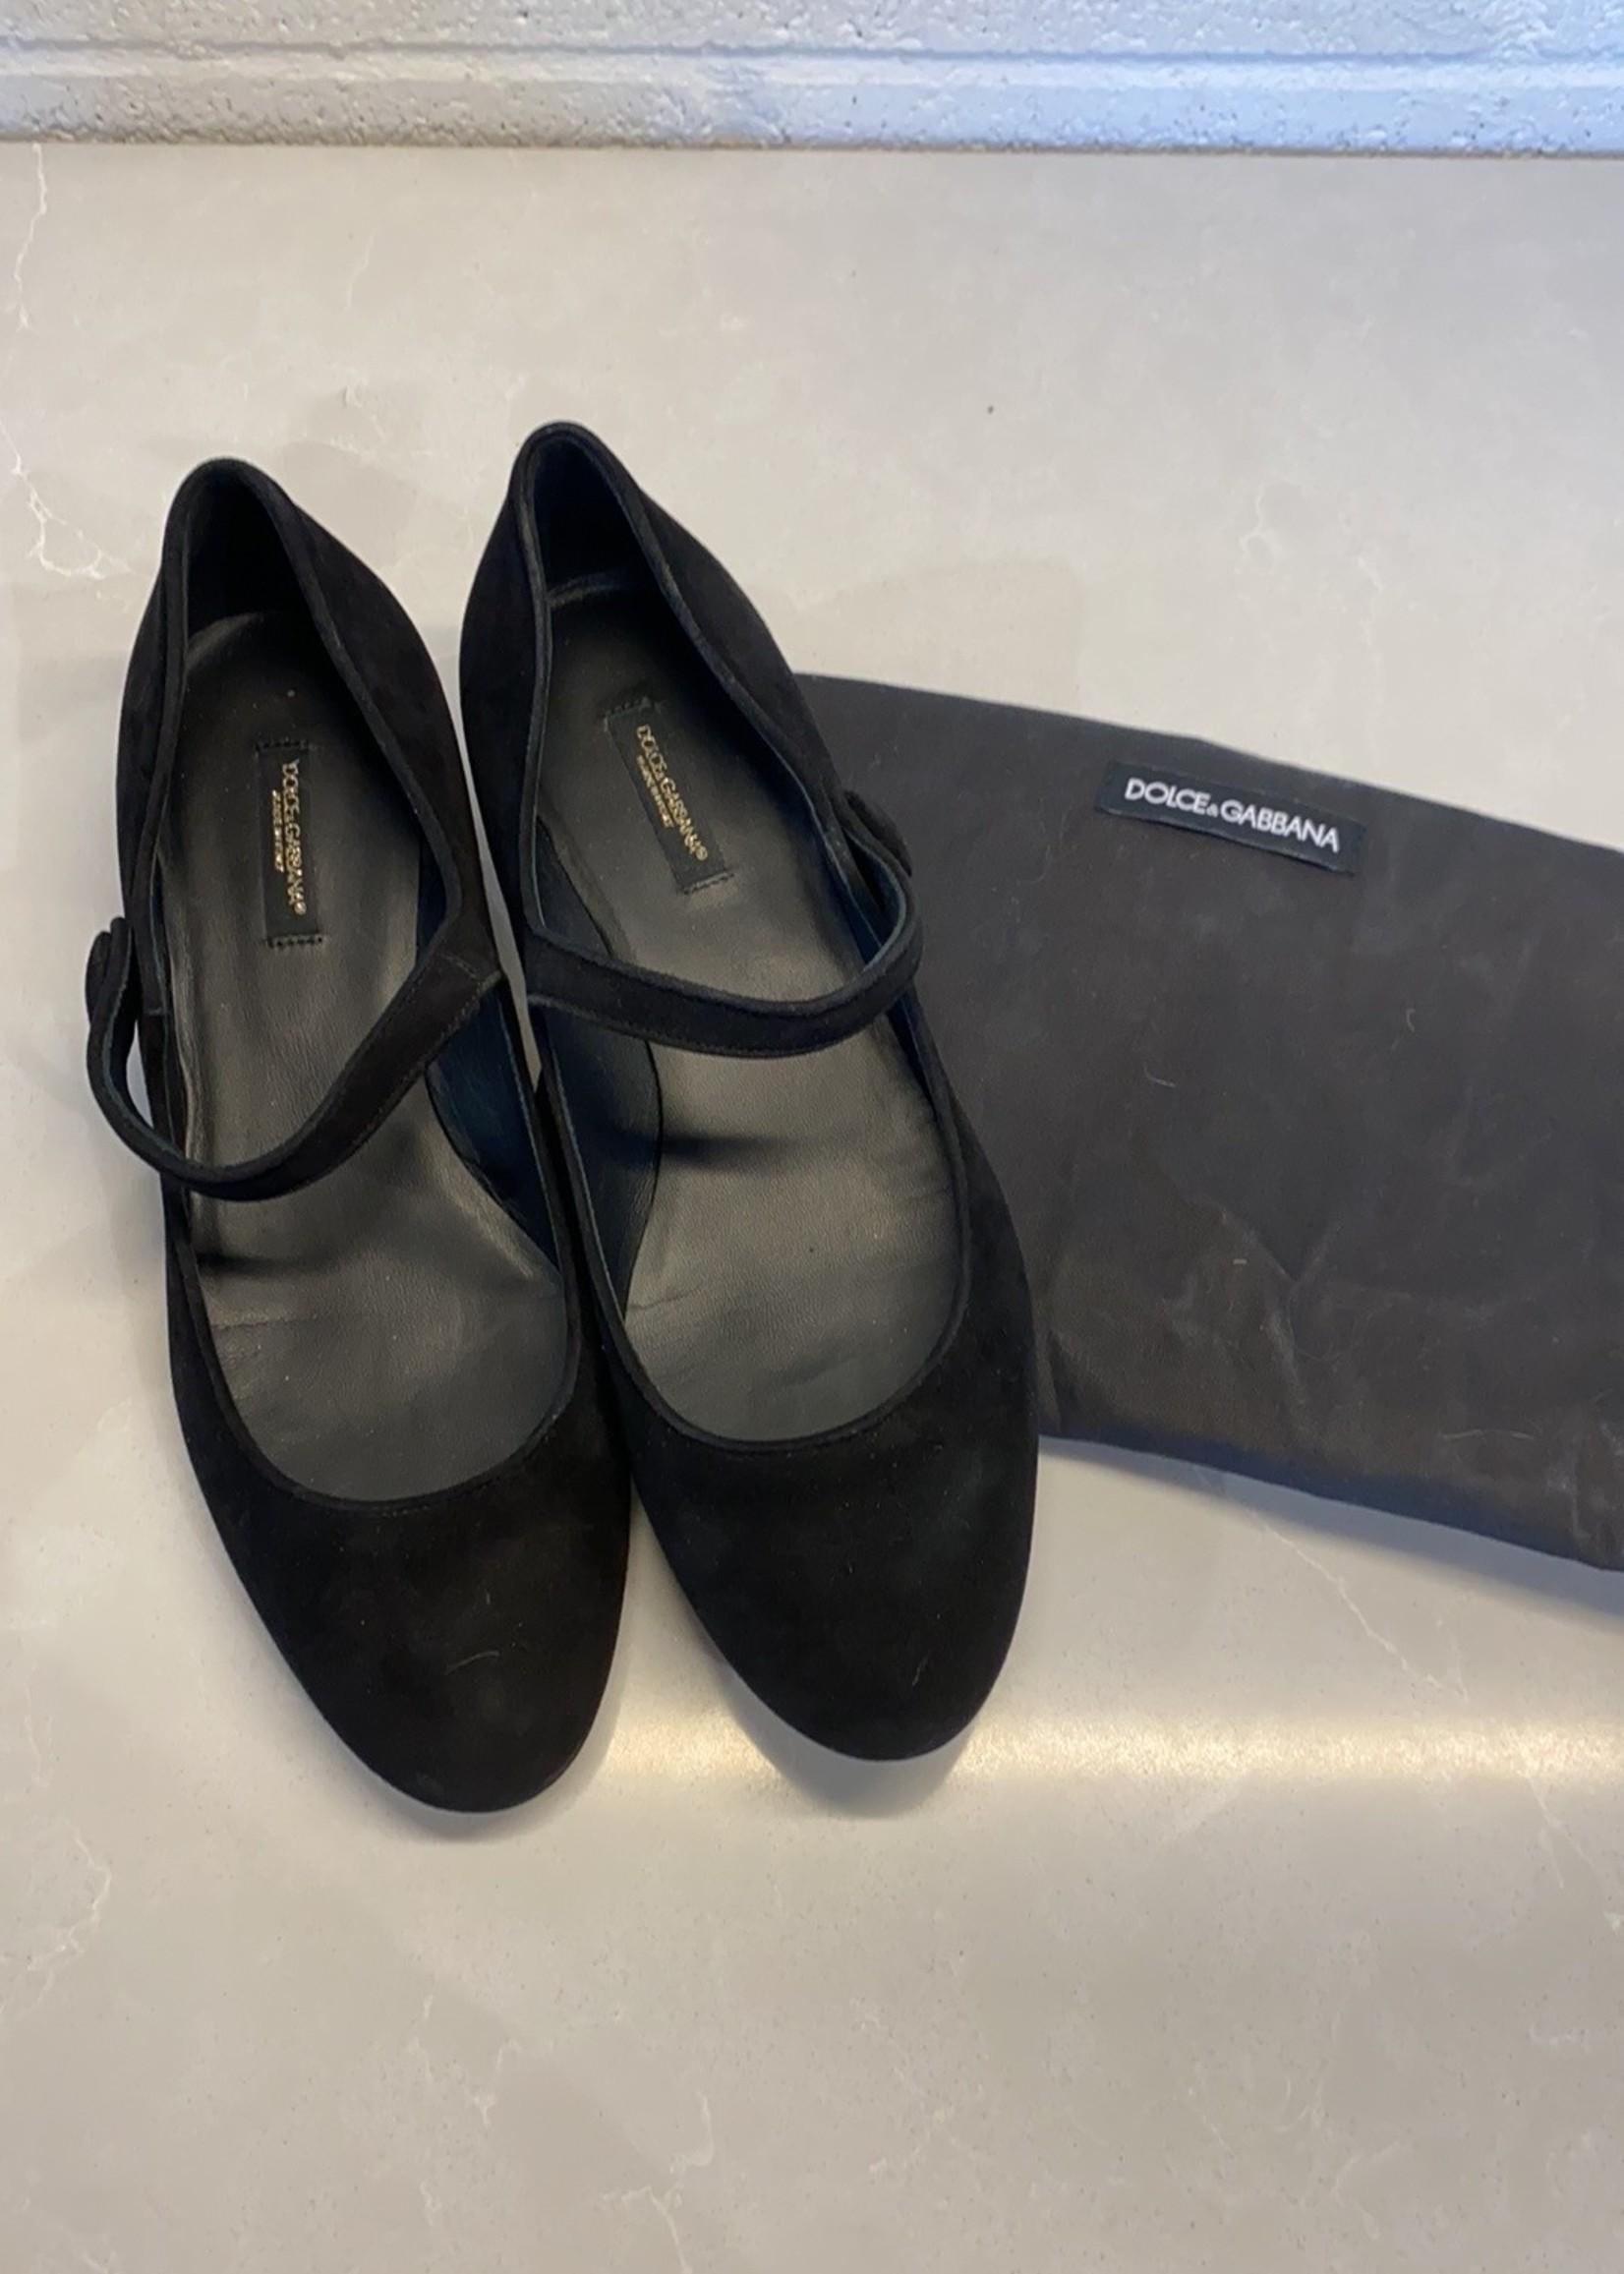 Dolce & Gabbana Black Suede Kitten Heel Sandals 39